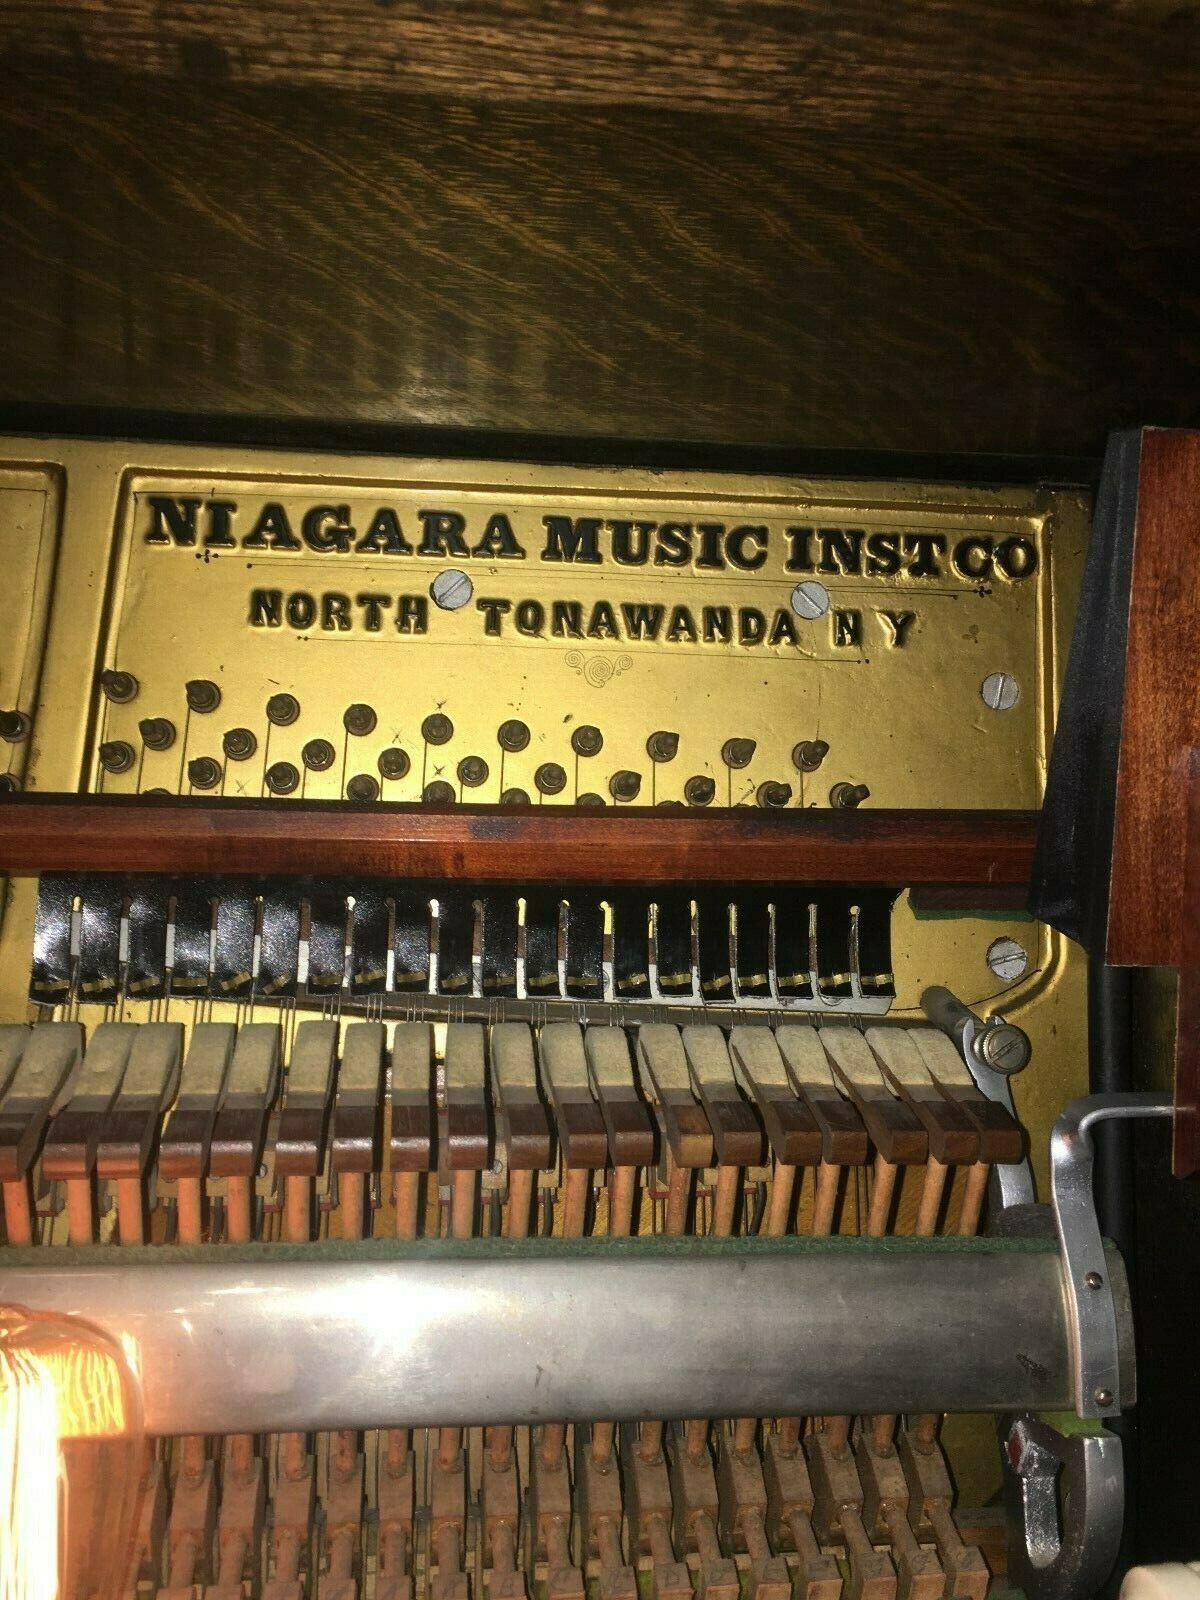 Niagara-Engelhardt-Player-Piano-3.jpg